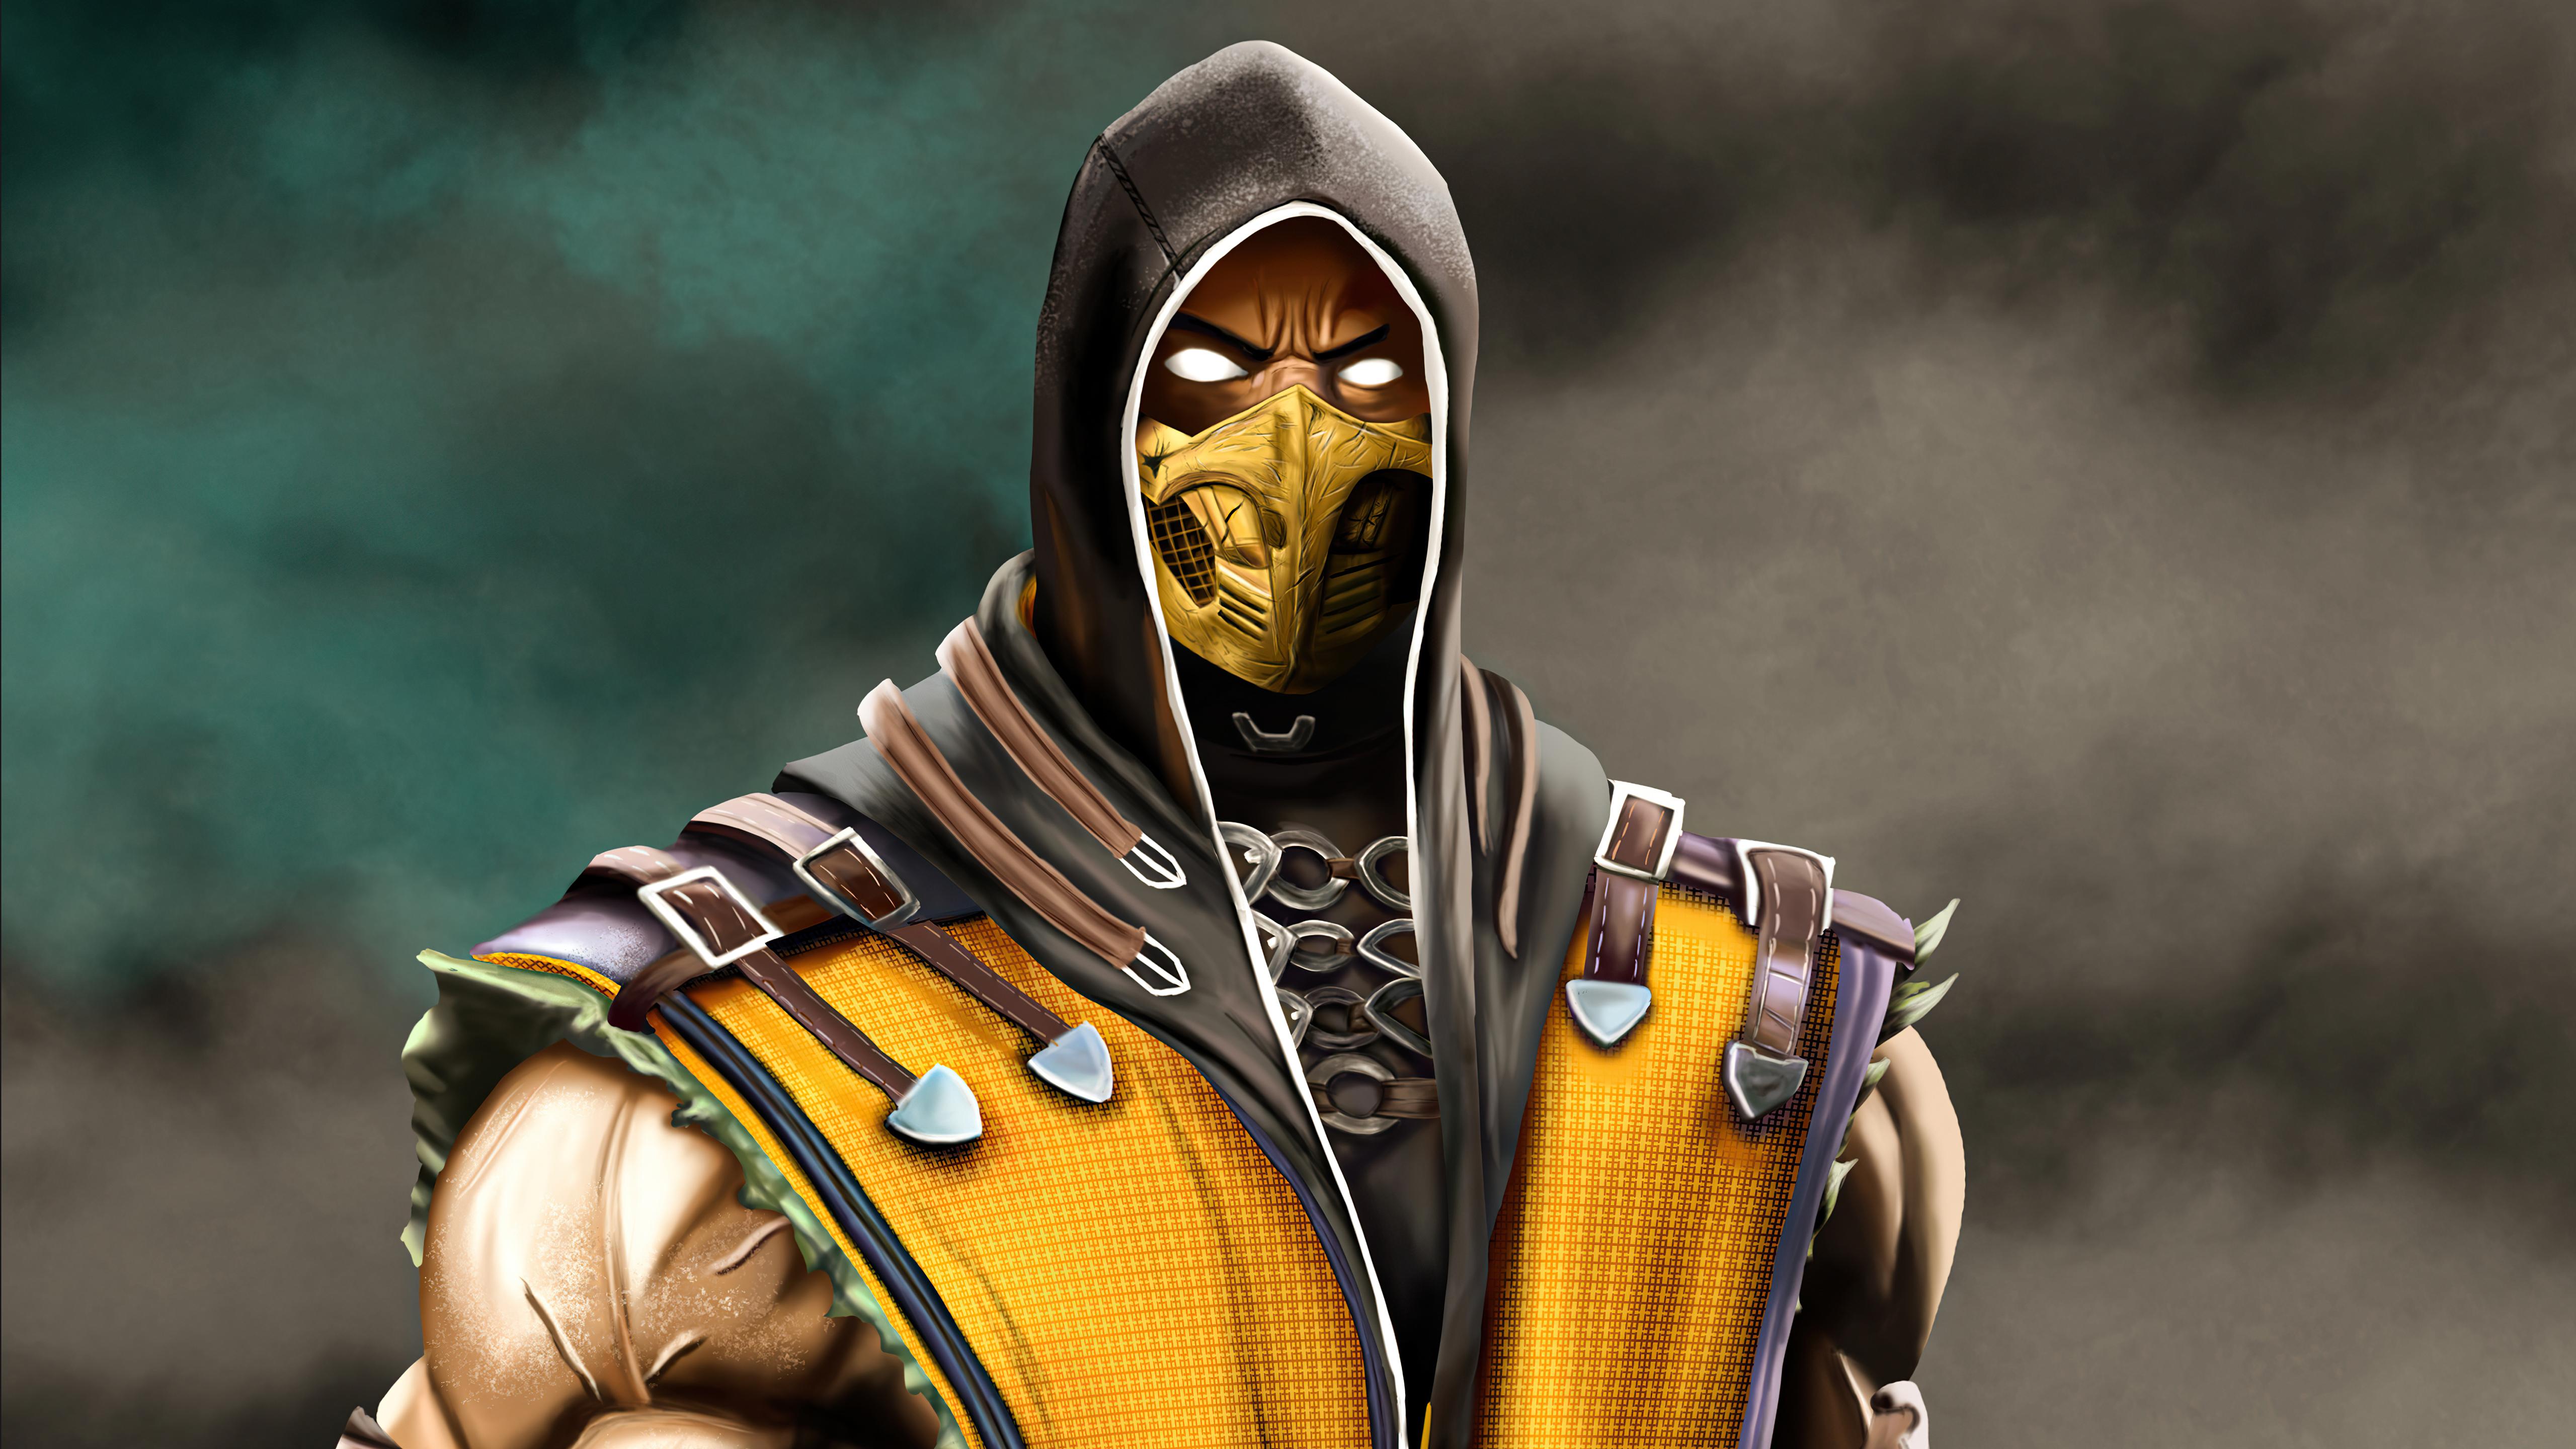 Wallpaper Scorpion from Mortal Kombat 2021